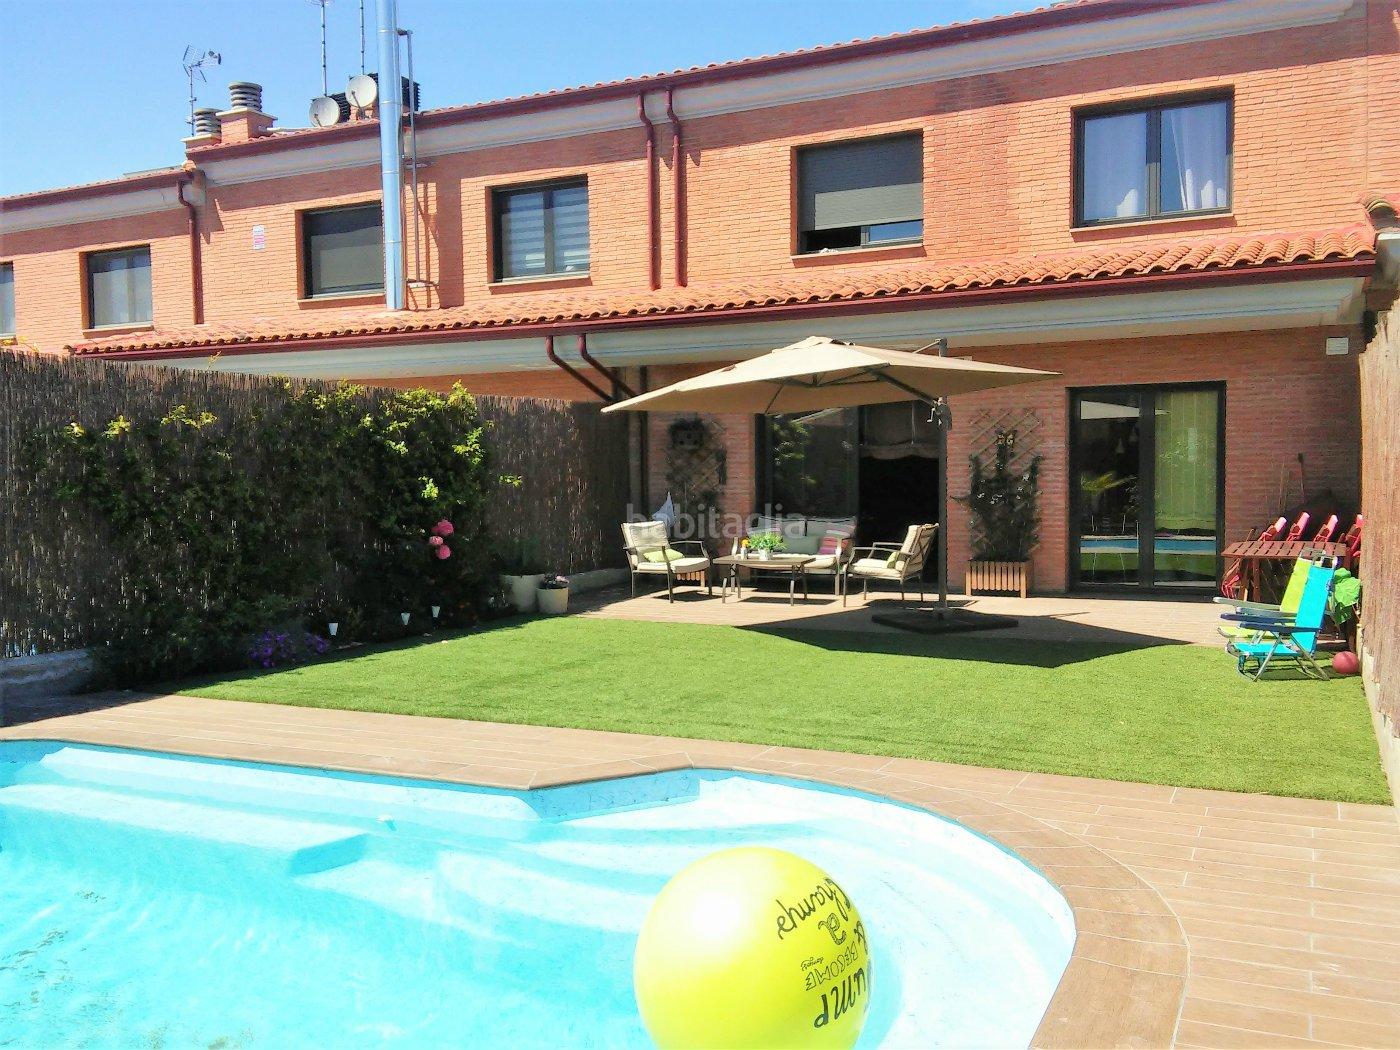 Casa adosada por en carrer talladell magnifica for Casas con jardin y piscina